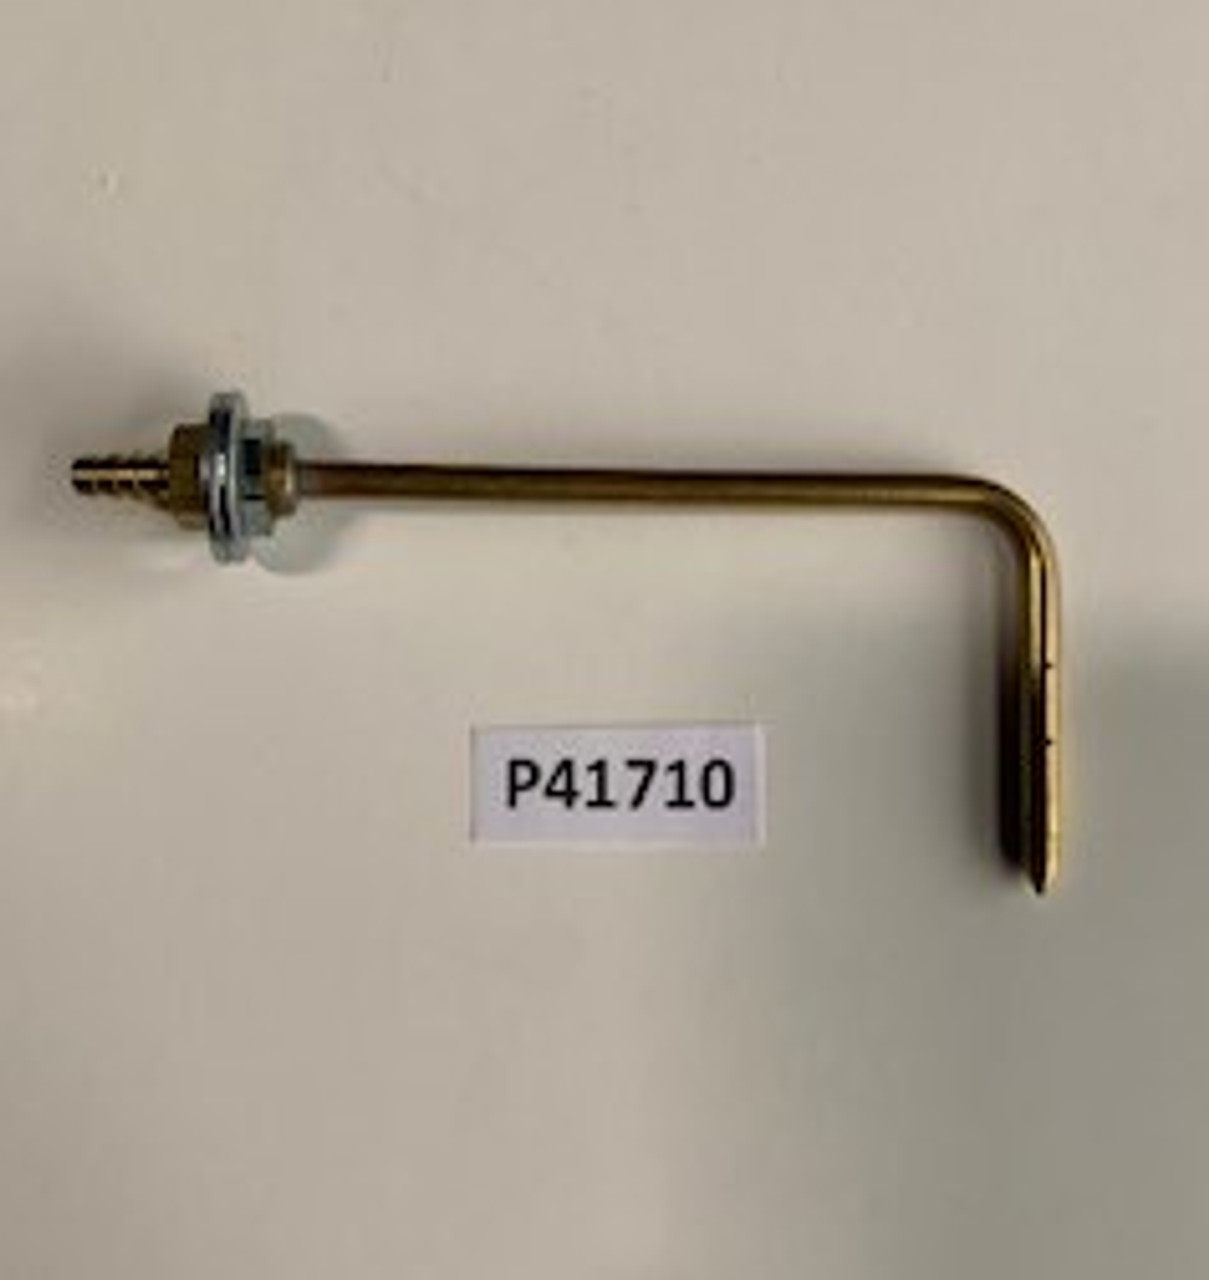 Probe, Static Pressure, Aaon, P41710